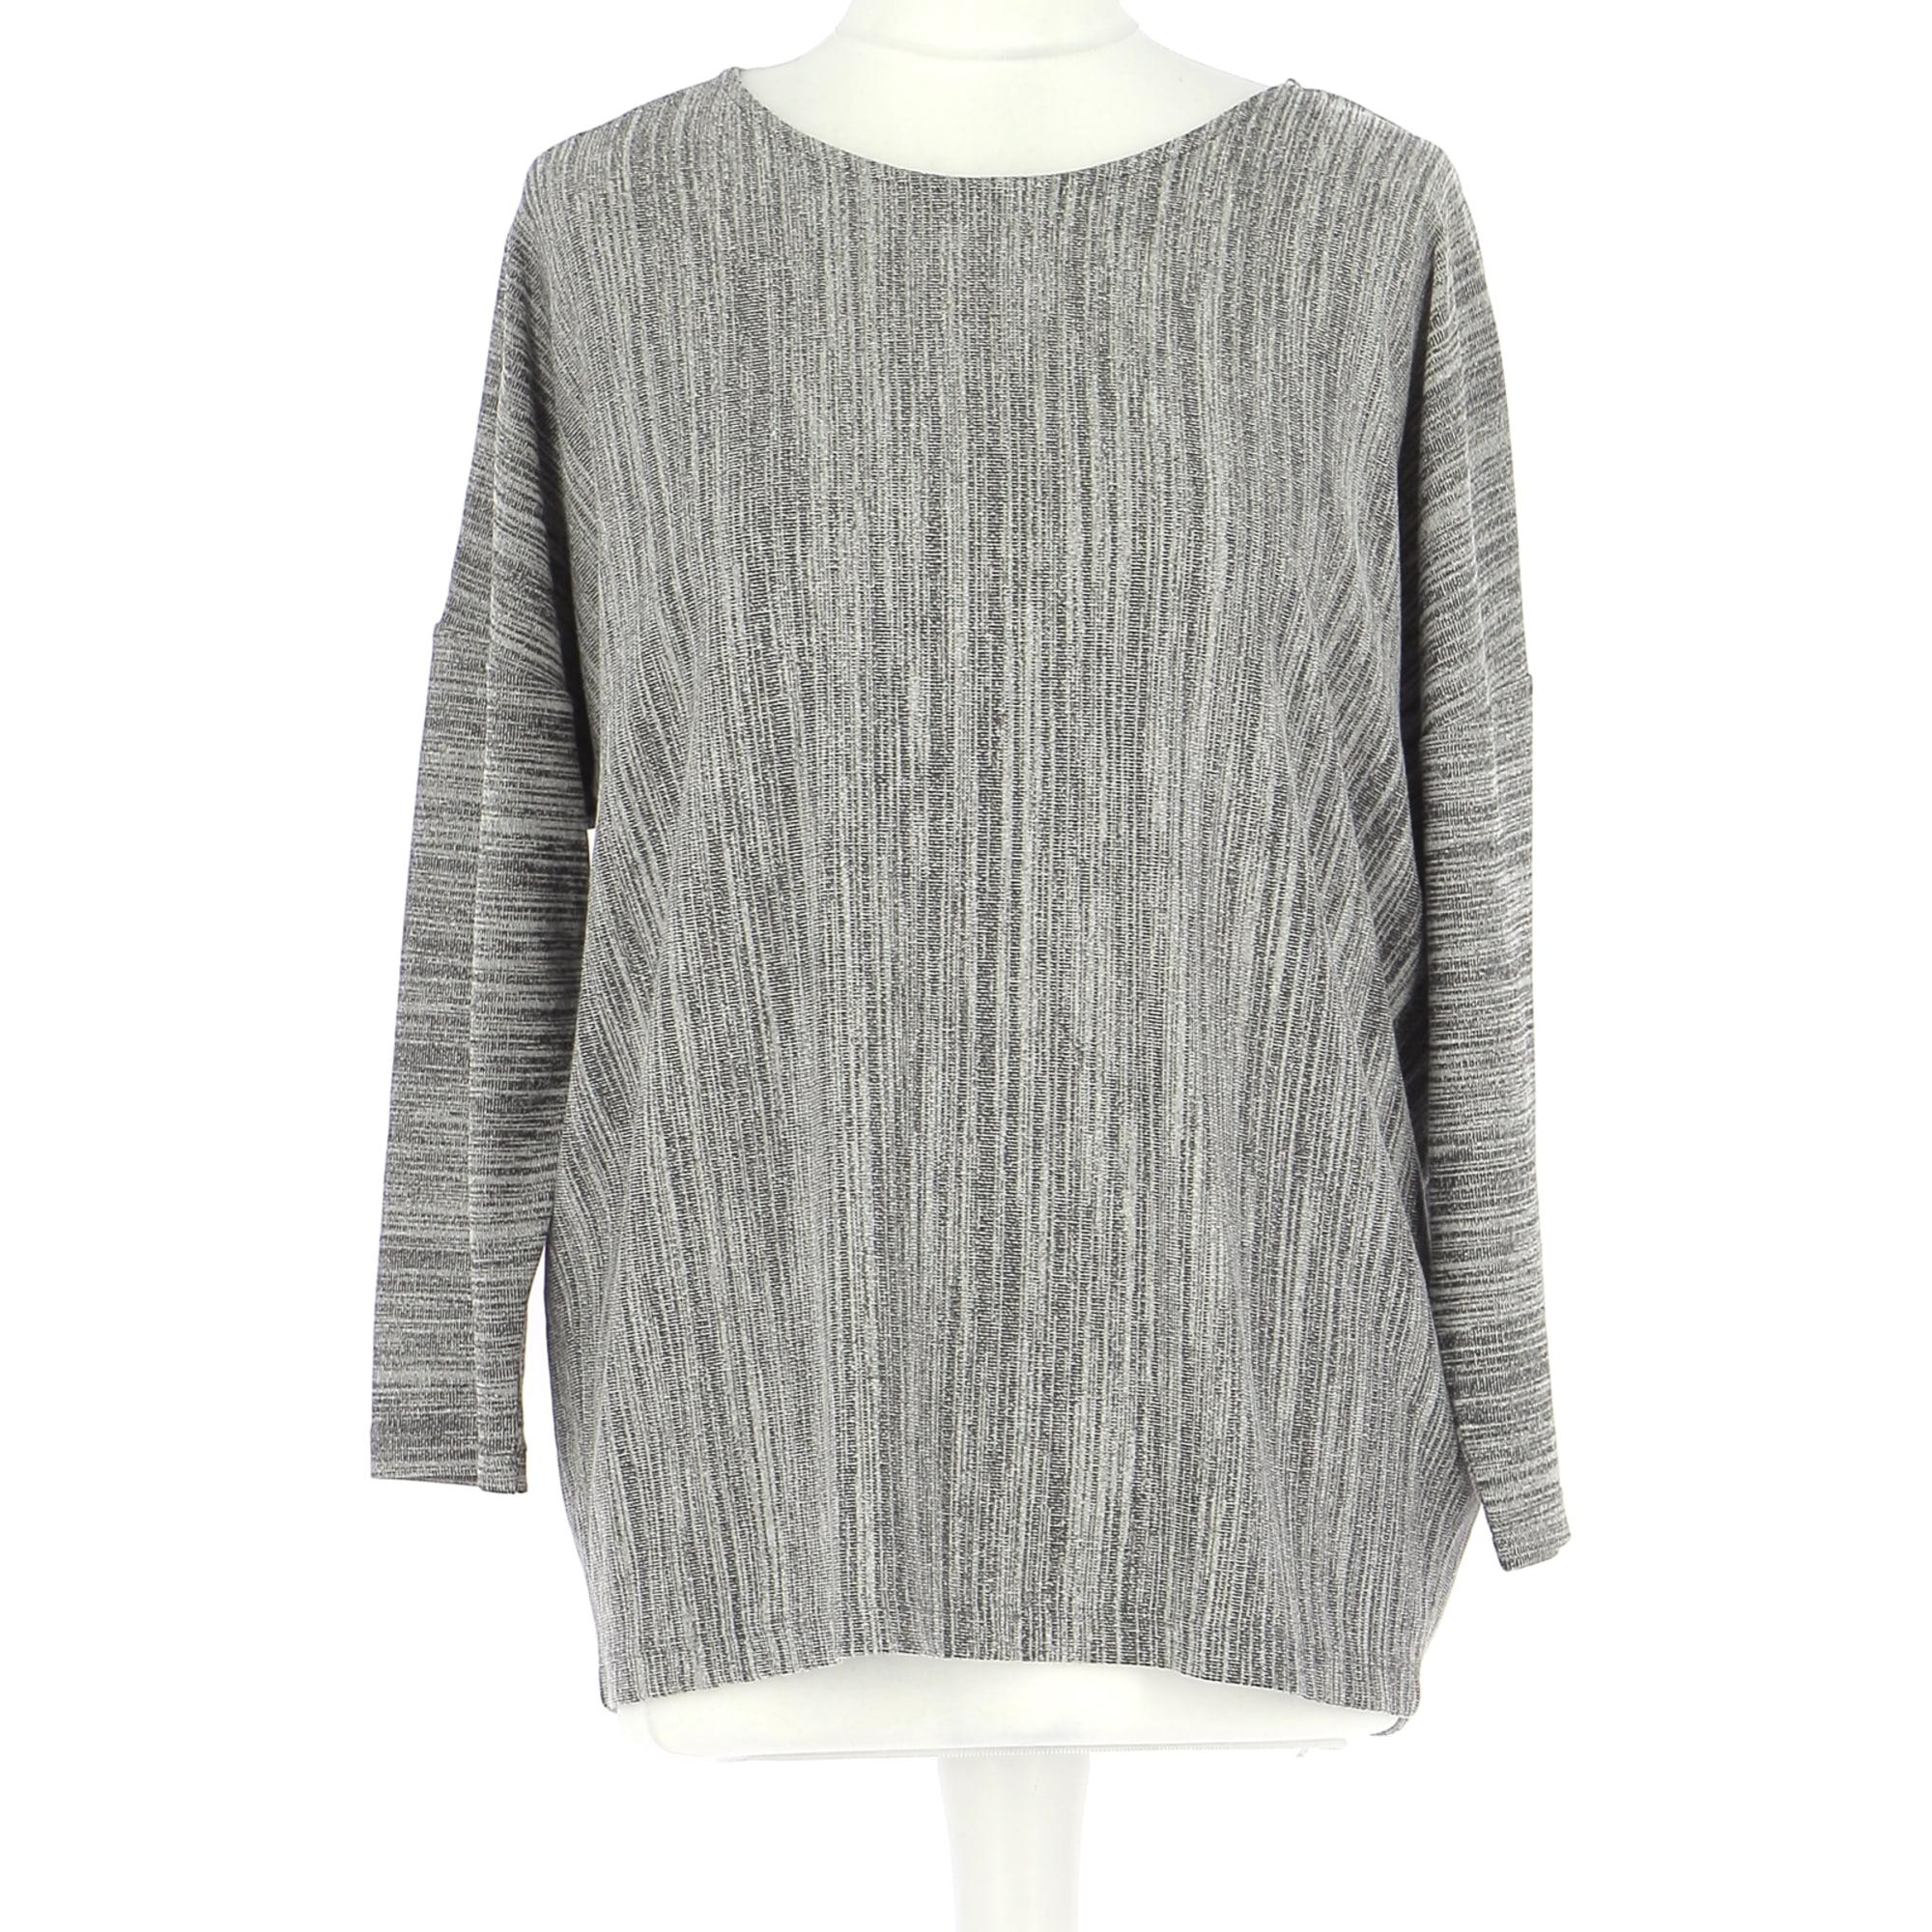 Top, T-shirt COS Gray, charcoal